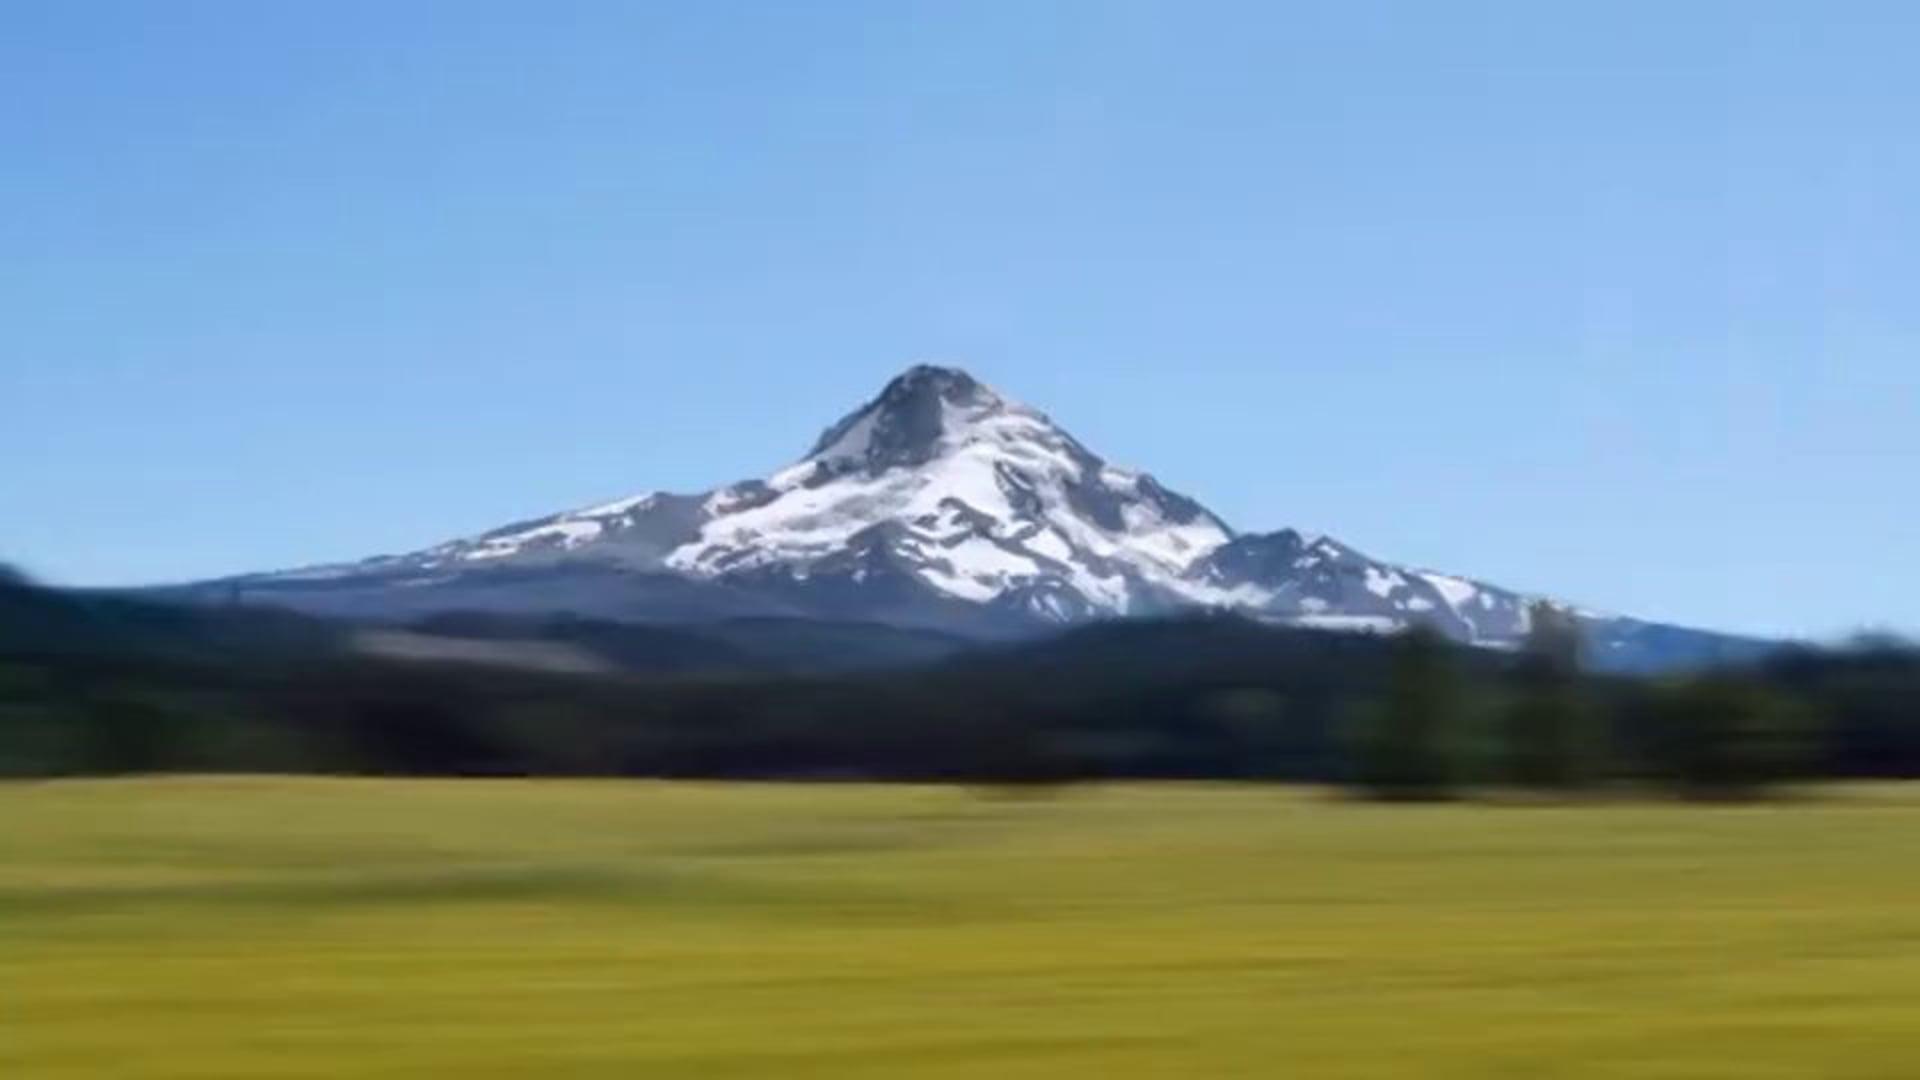 Hyperlapse - Spinning a Mountain (Mt. Hood, OR)